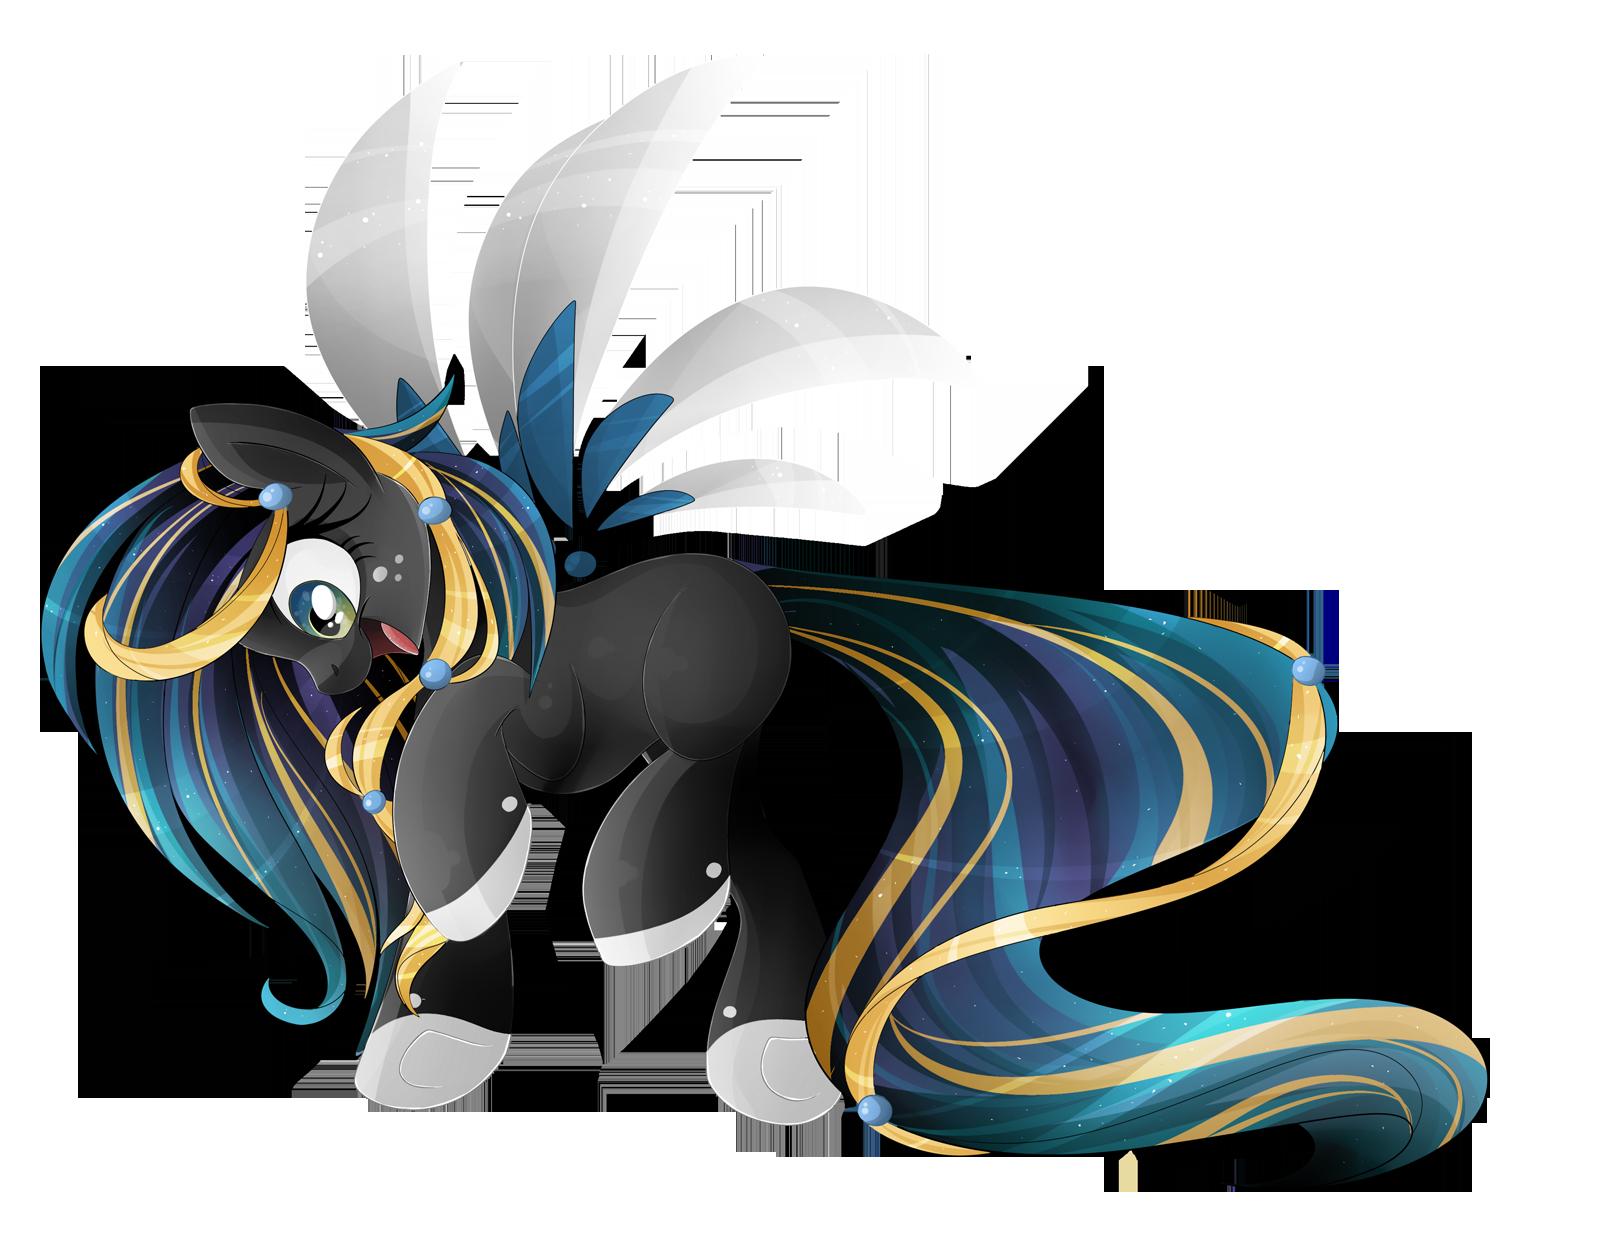 Night Wallpaper No Logo By Ualgreymon On Deviantart: Night Pony By BlackFreya On DeviantArt